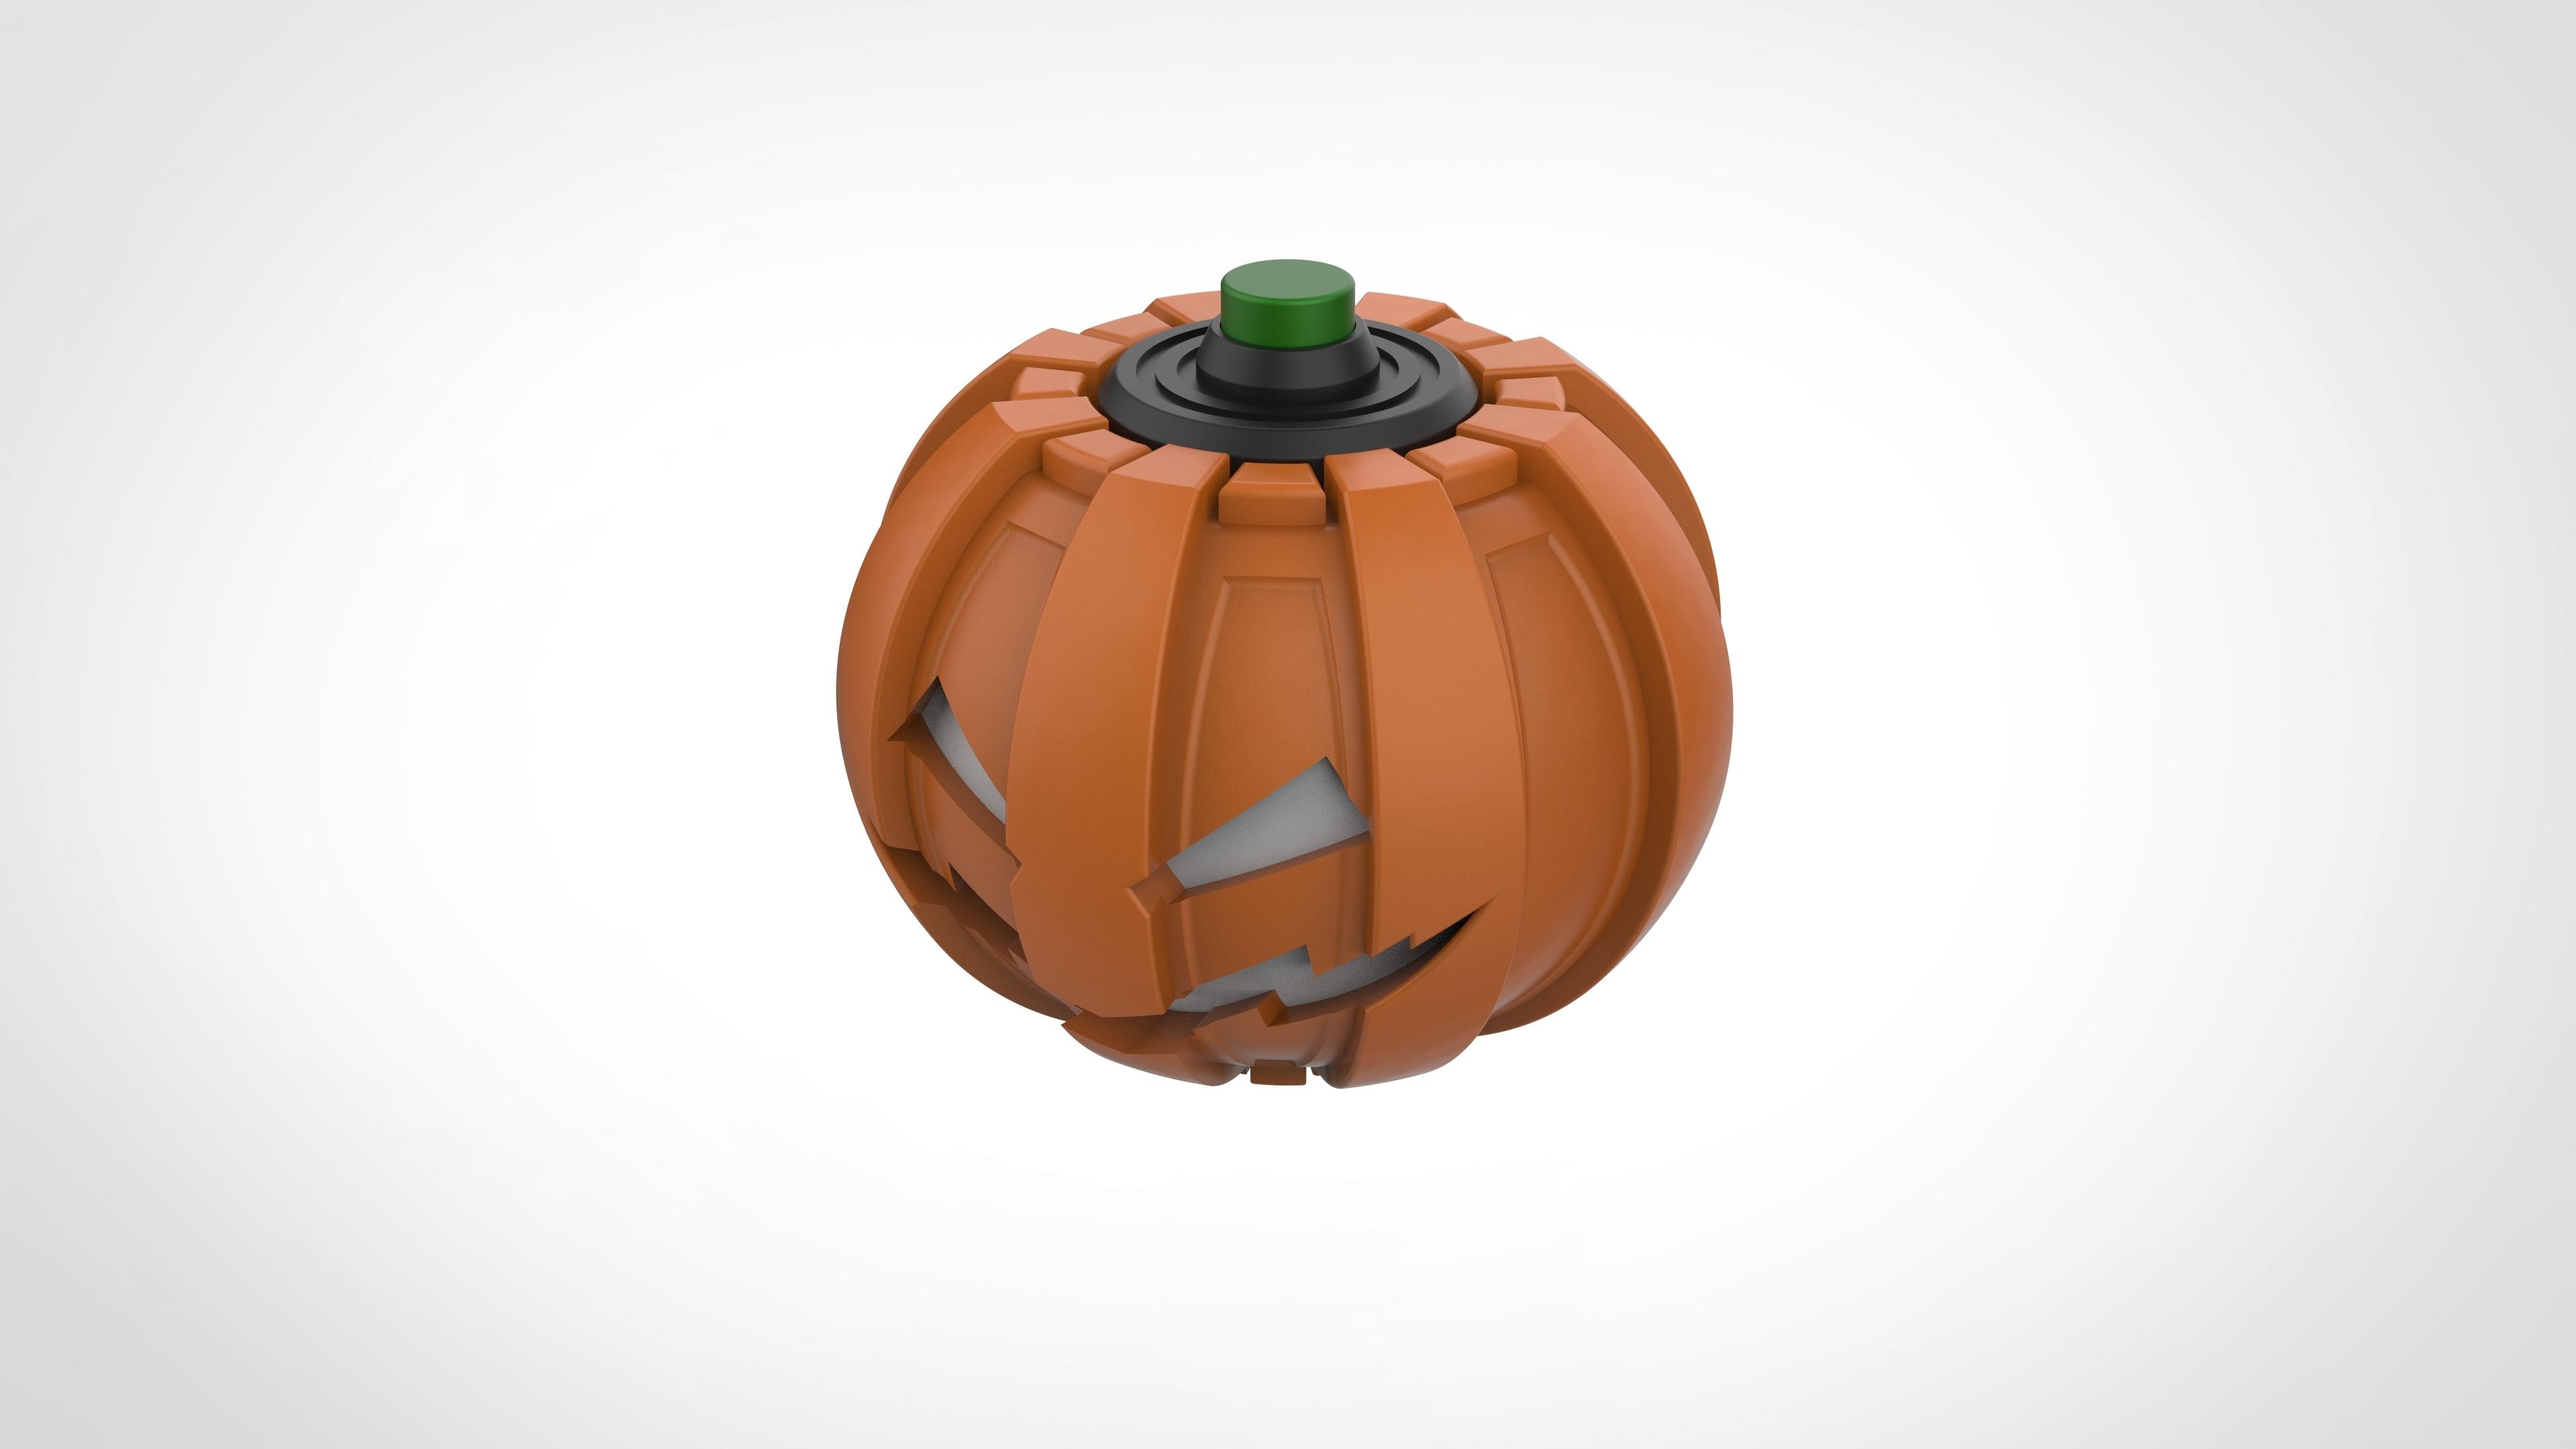 002.jpg Download 3MF file Green goblin bombs from the Spide-Man comics • 3D print model, vetrock